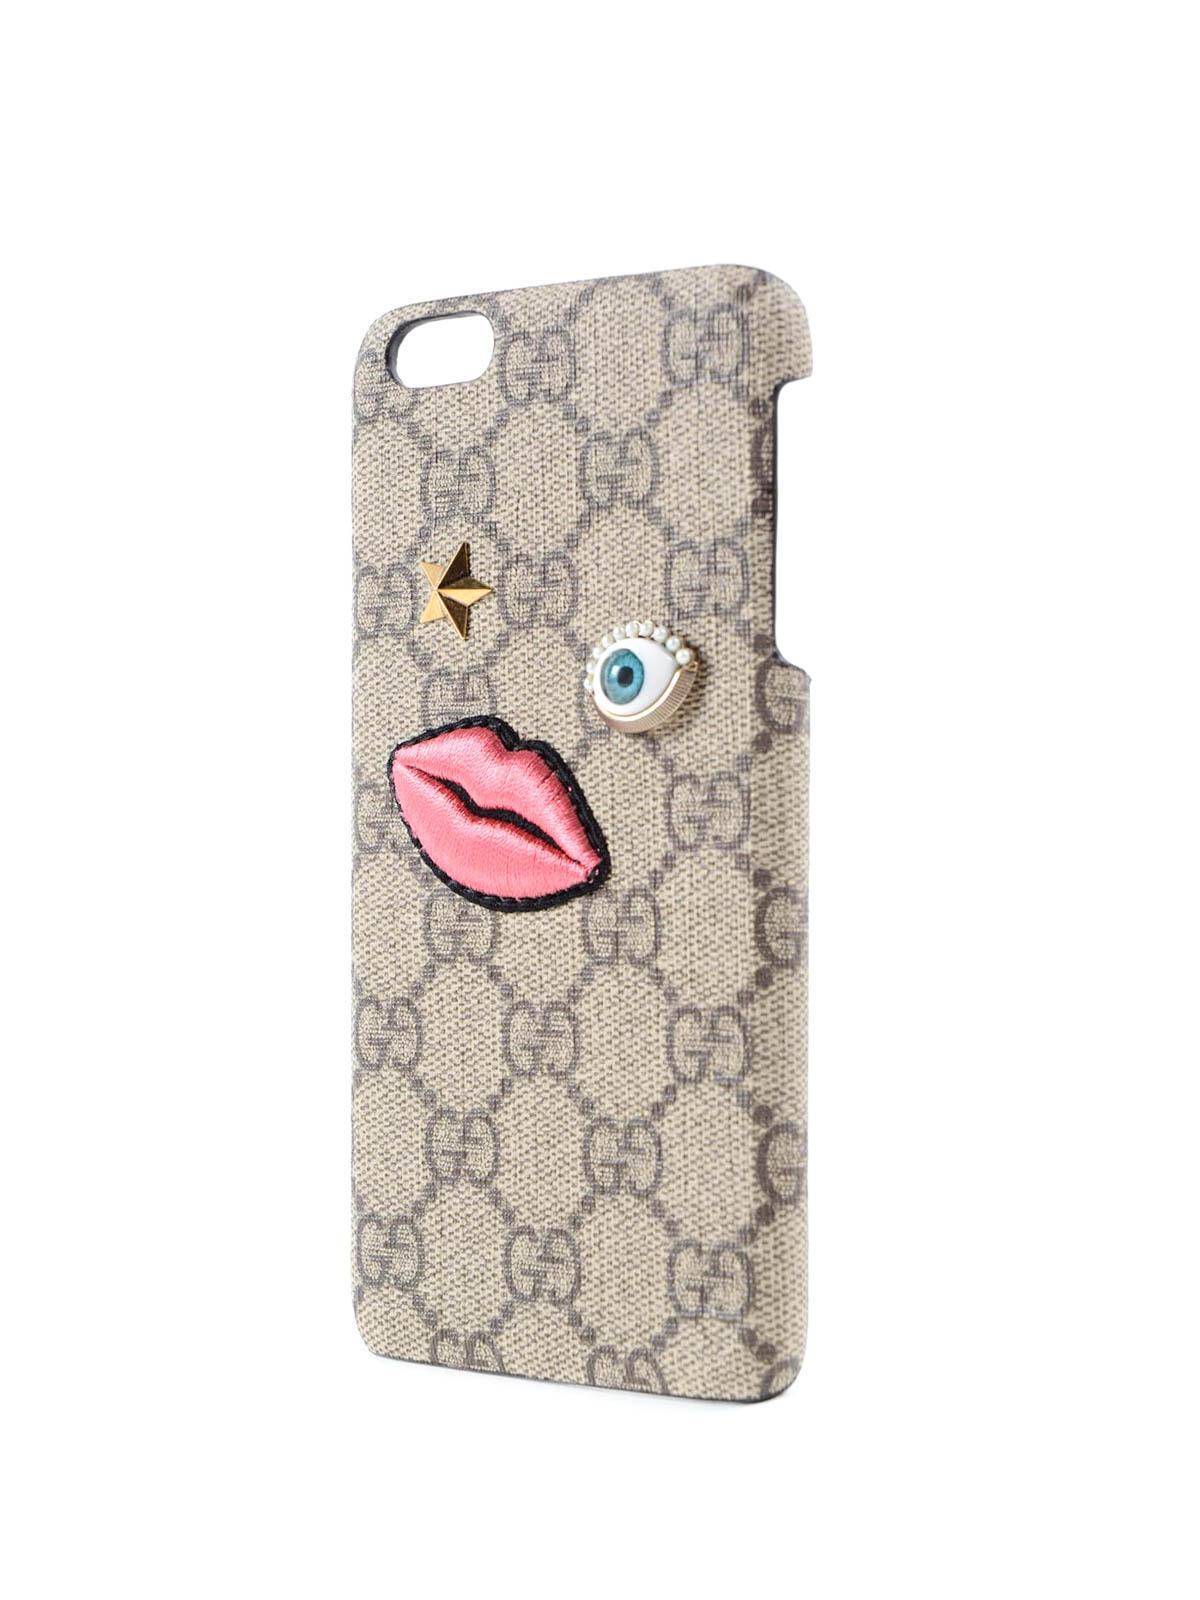 outlet store 695de bac94 Gucci - GG Supreme iPhone 6PL - Cases & Covers - 431407/K05UT 8875